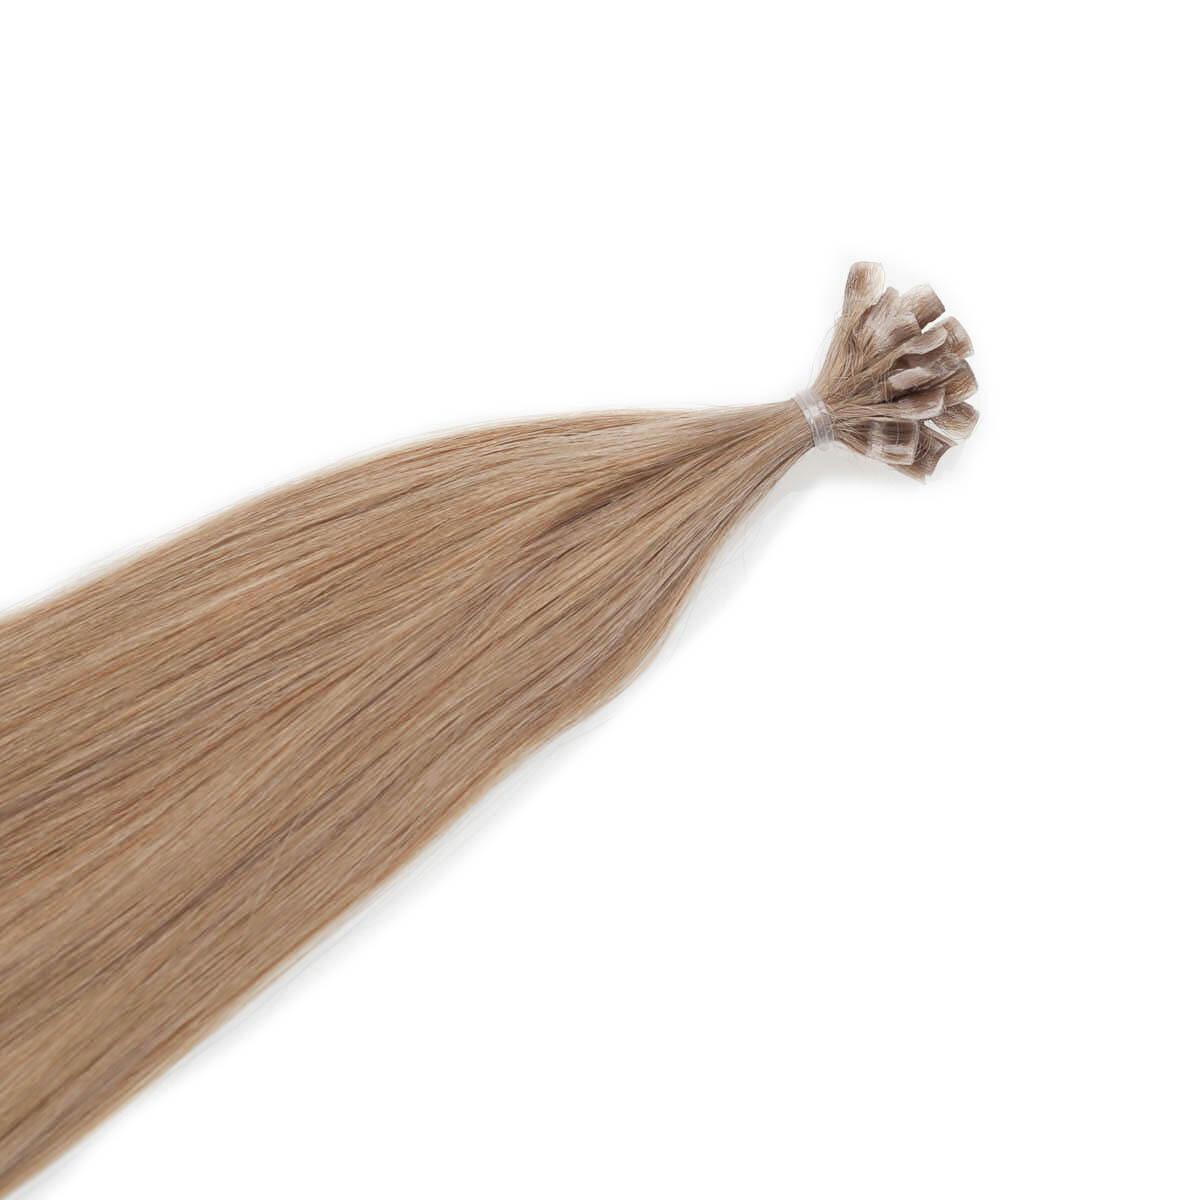 Nail Hair Original 7.3 Cendre Ash 30 cm